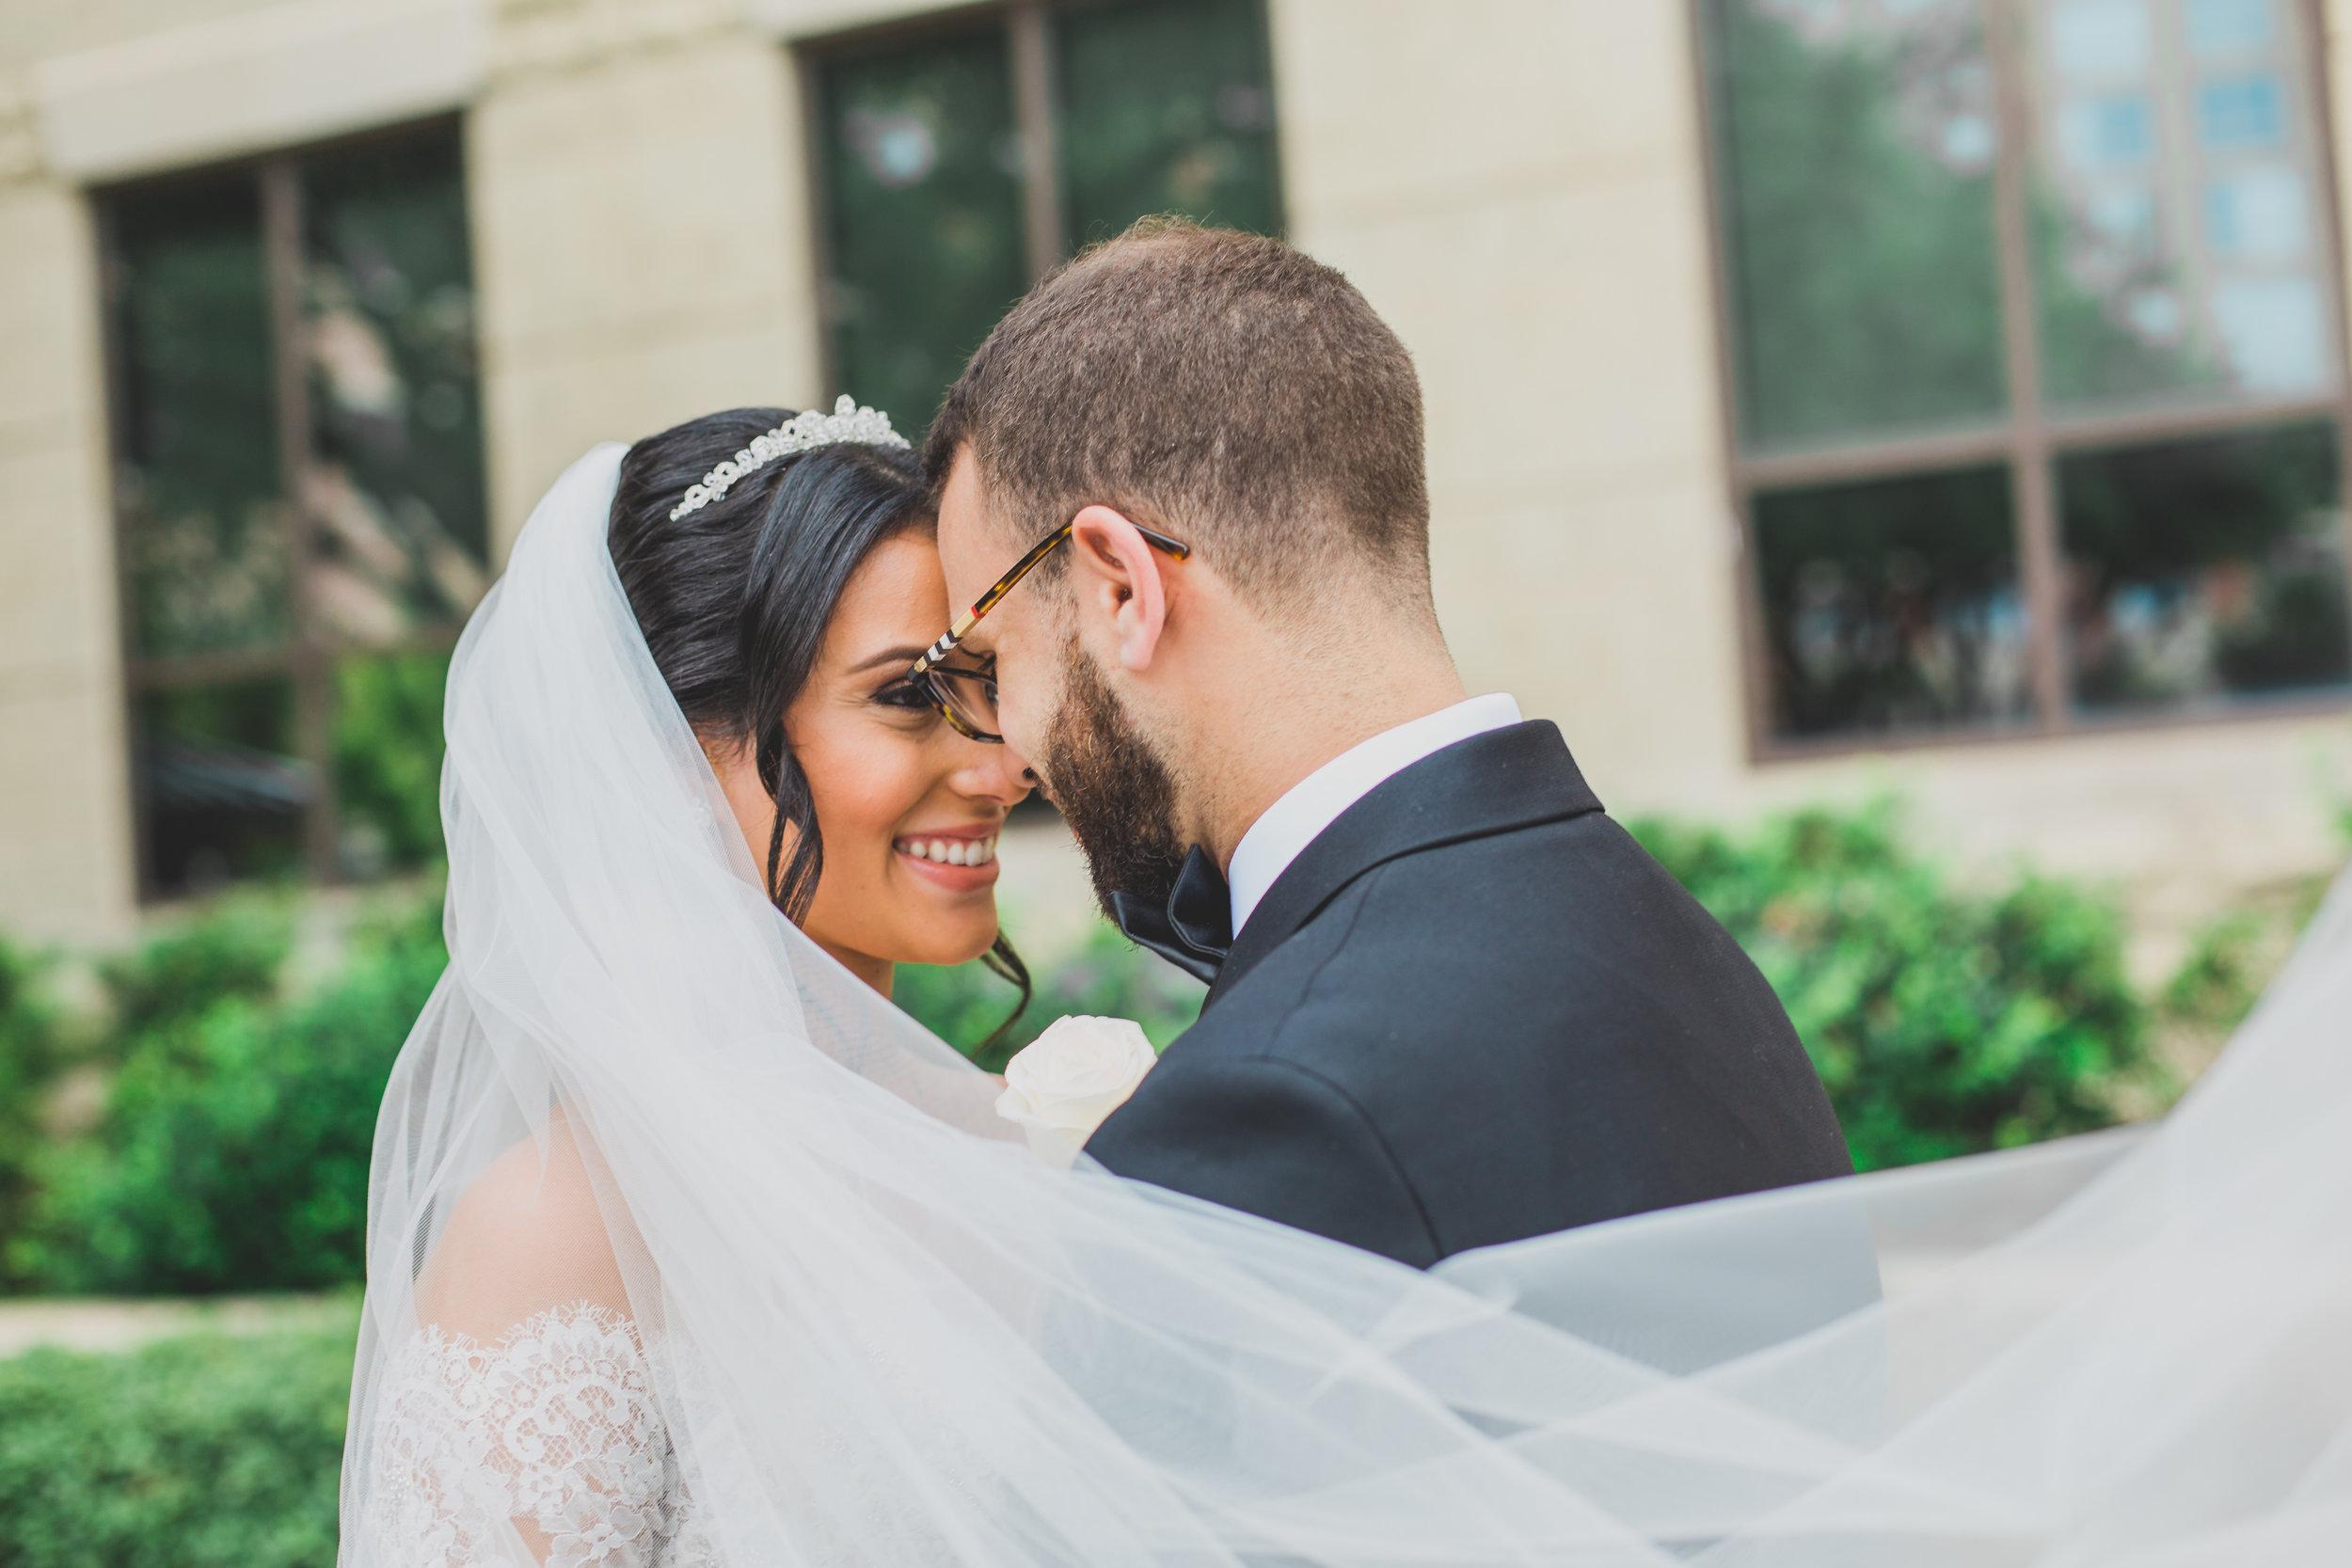 sugar-land-tx-wedding-photography-marriott-2